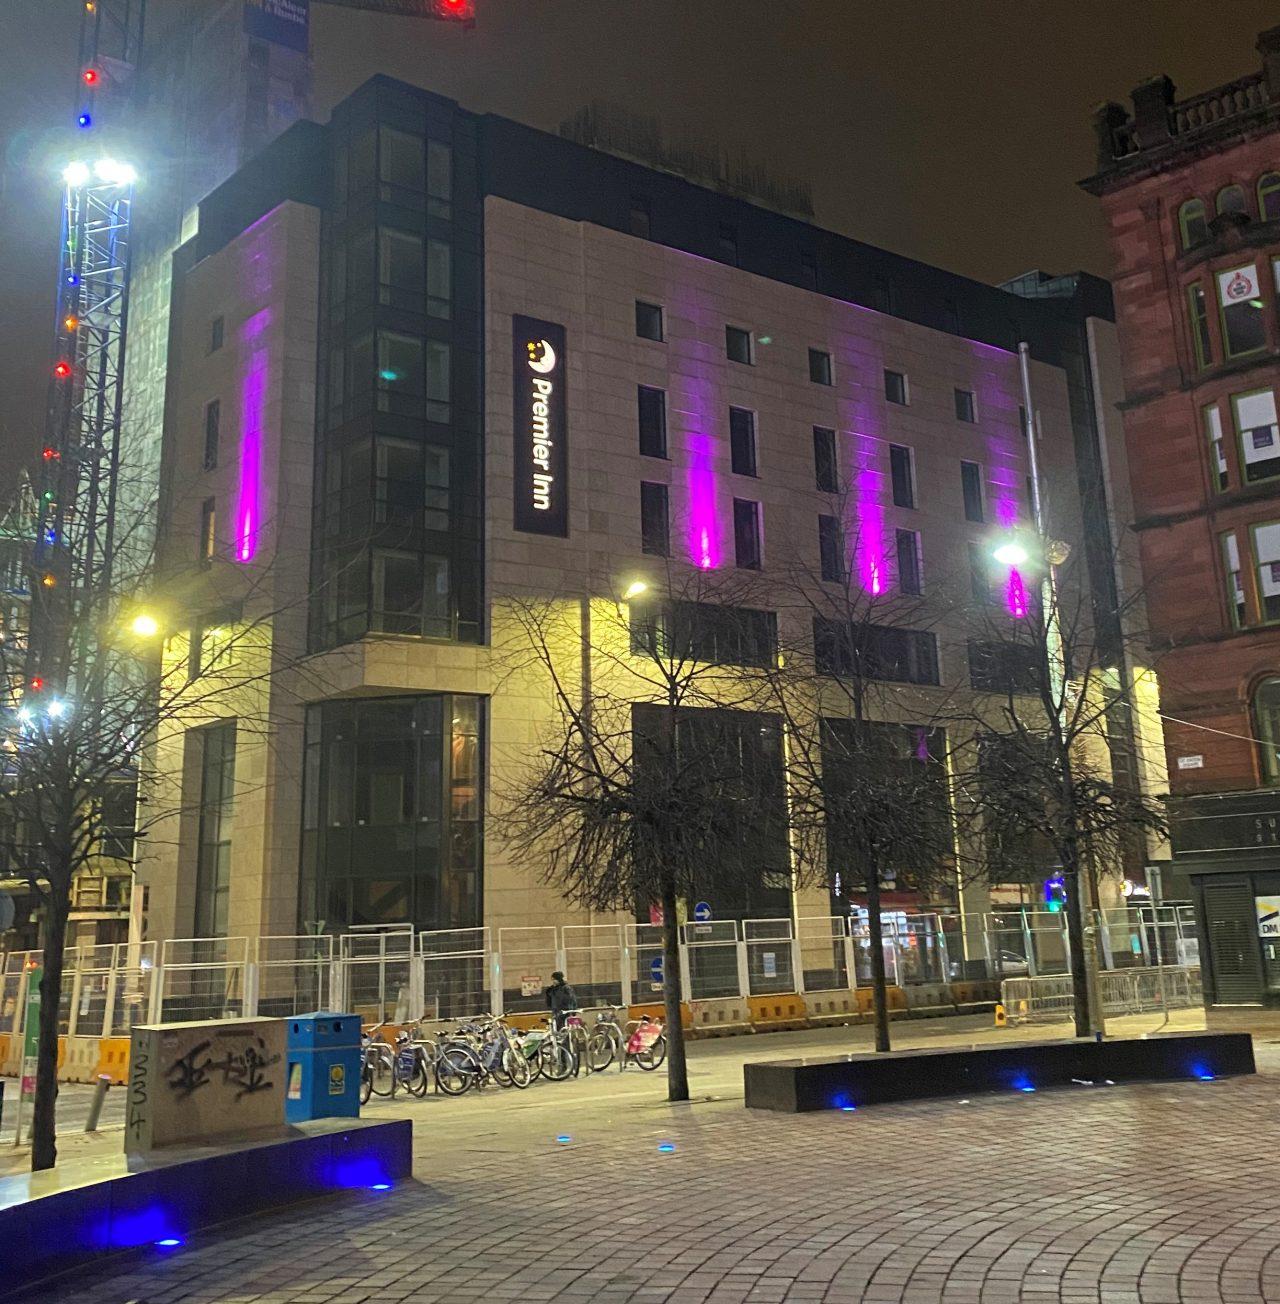 Premier Inn Glasgow City Centre St Enoch Square January 2021 2